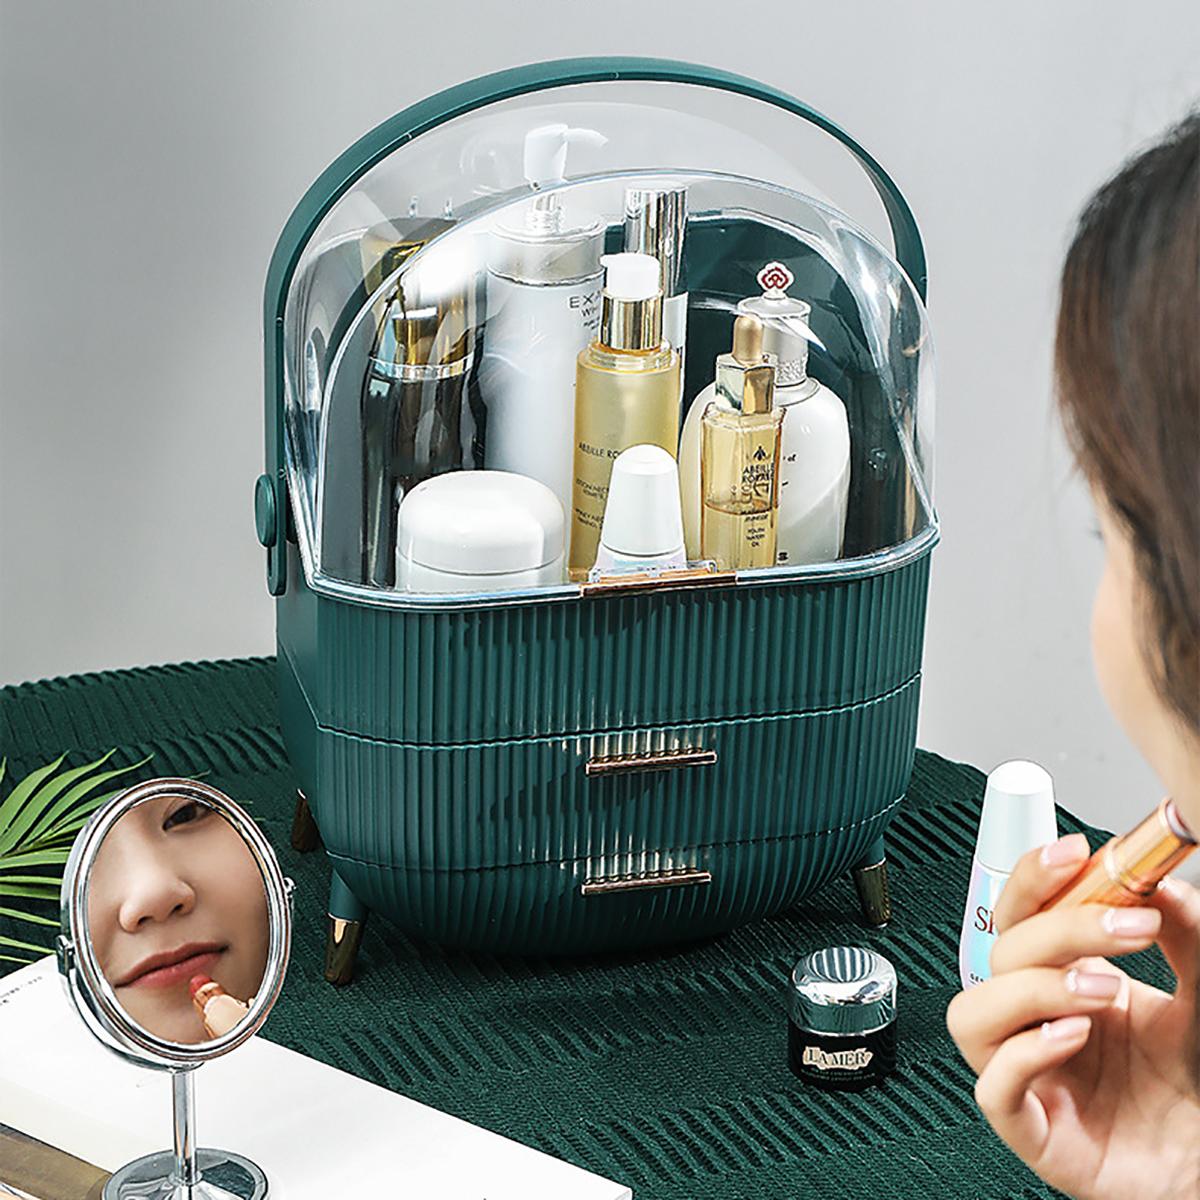 Bakeey Desktop Storage Box Makeup Organizer Waterproof & Dustproof Cosmetic Organizer Box Fully Open Makeup Display Boxes Makeup Caddy Holder